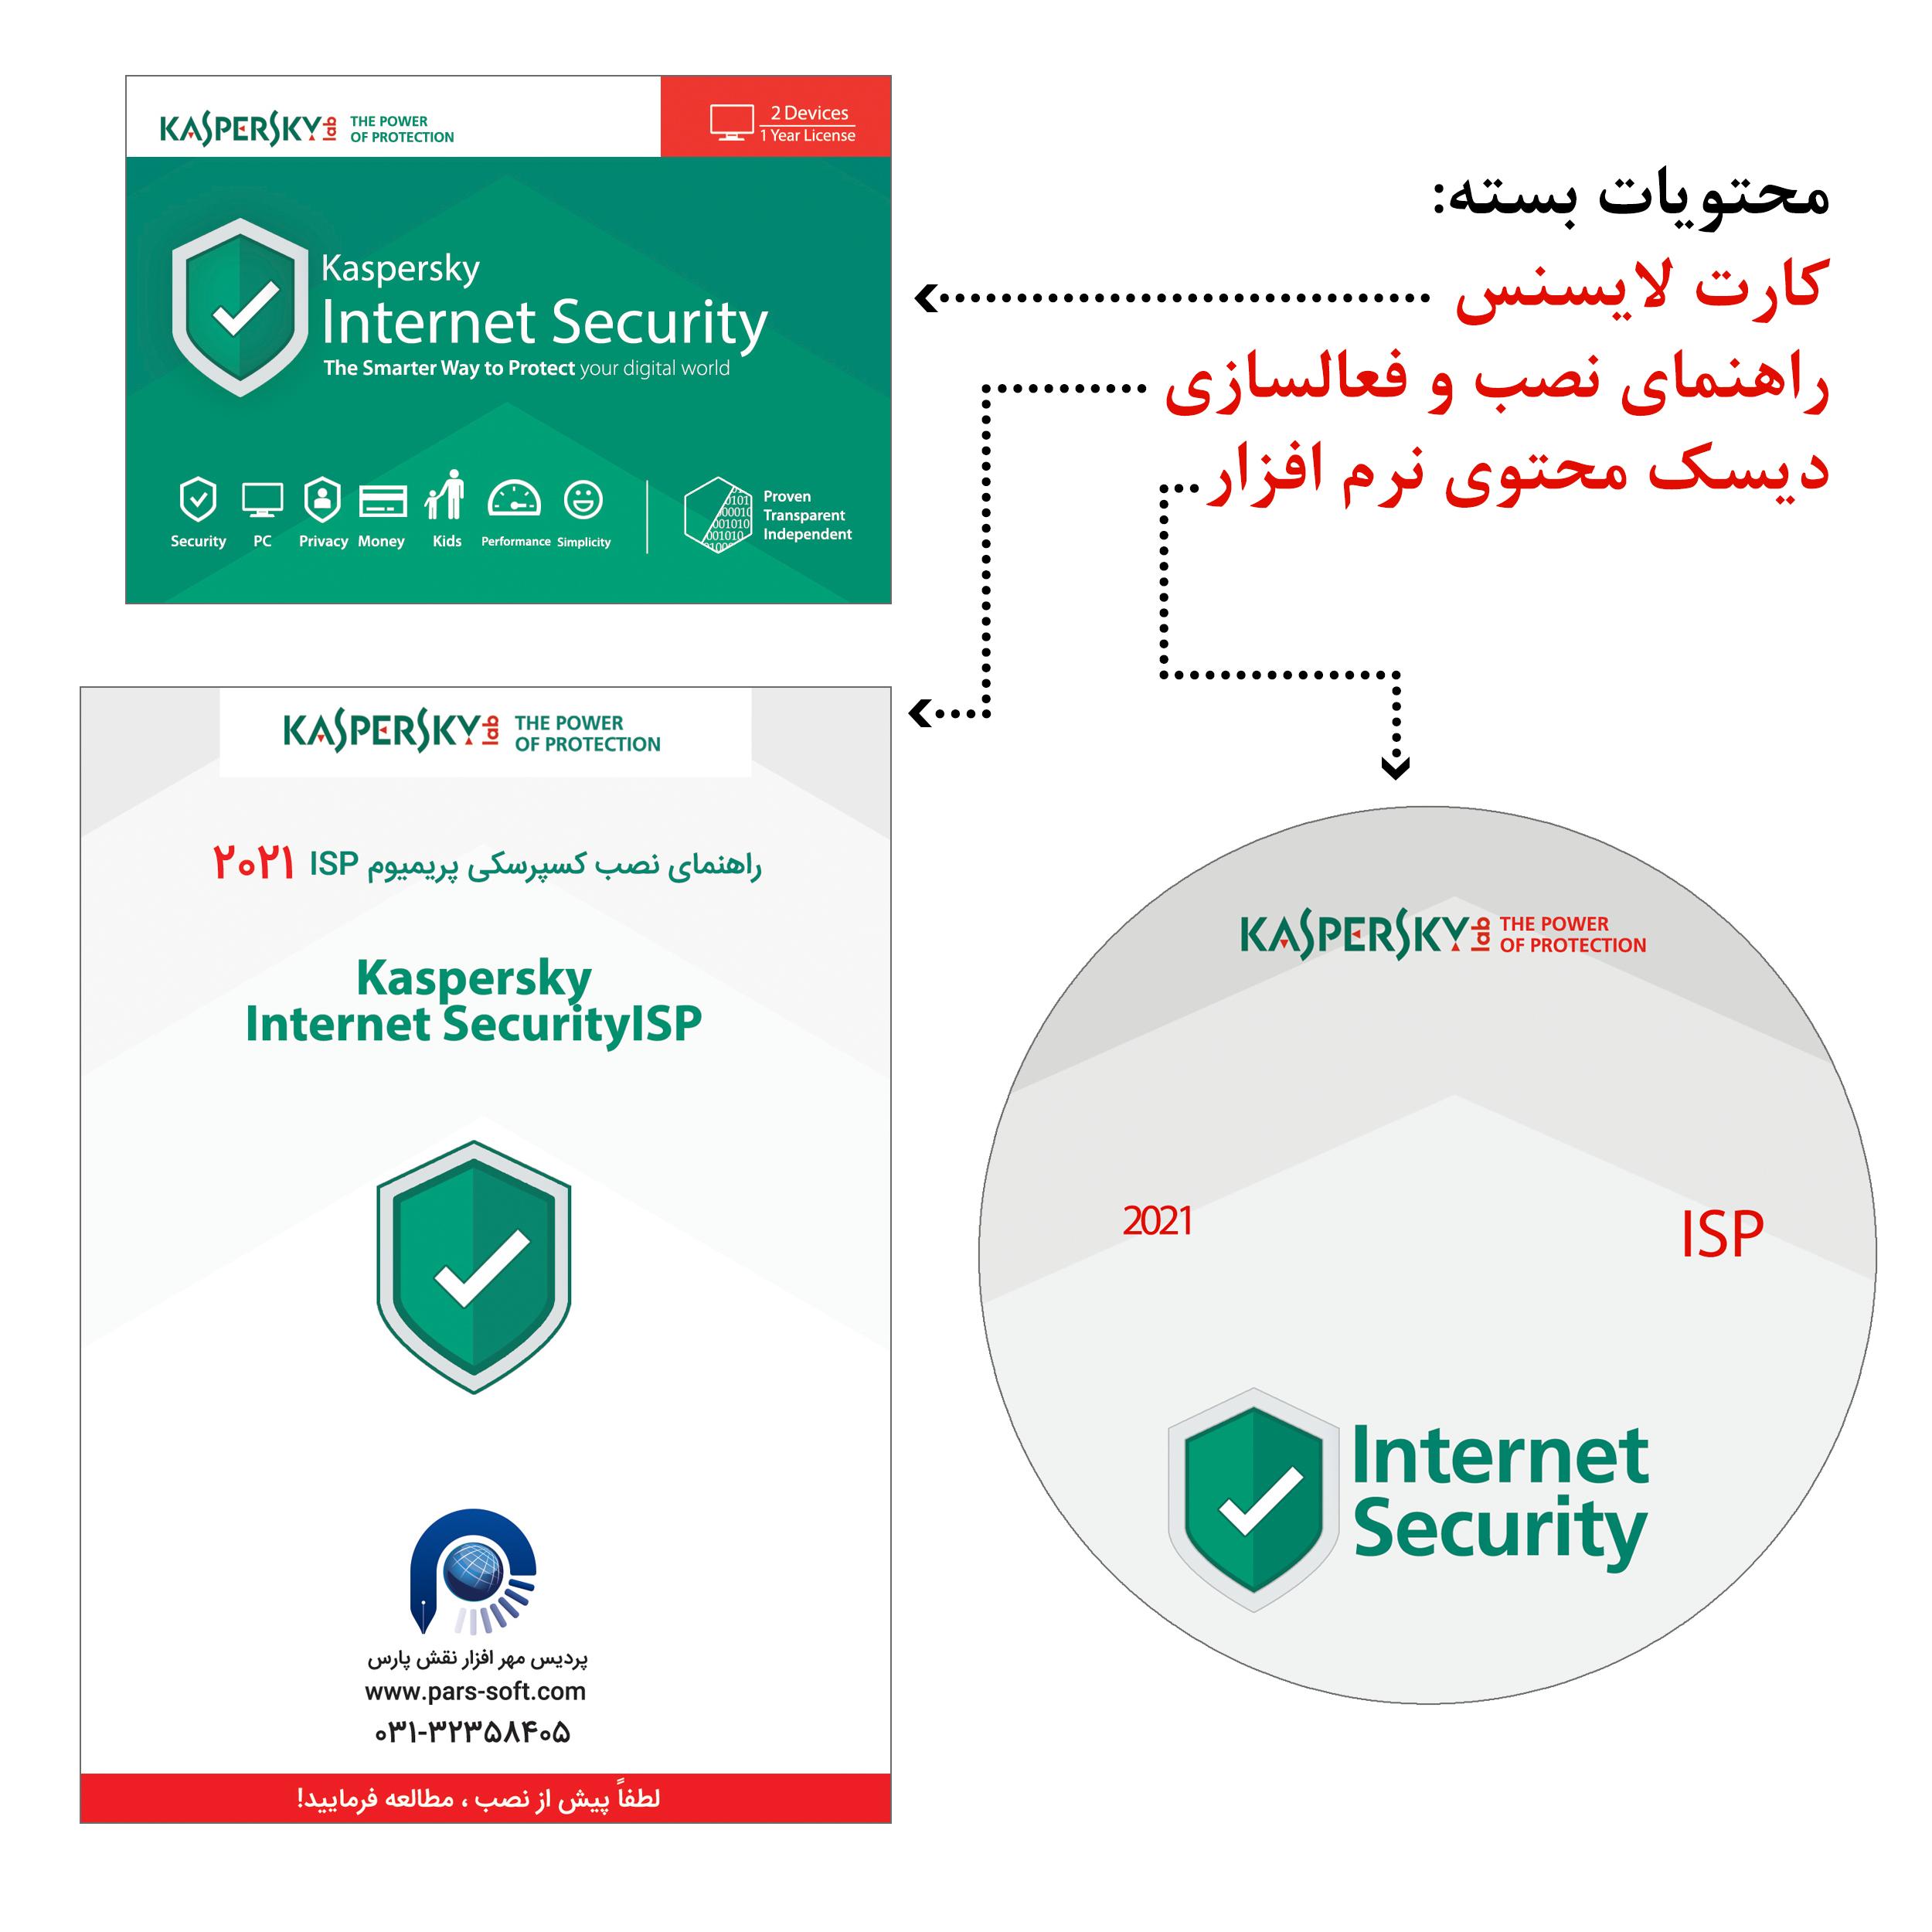 نرم افزار آنتی ویروس کسپرسکی لب نسخه اینترنت سکیوریتی پریمیوم آی اس پی 2021 دو کاربره 1 ساله